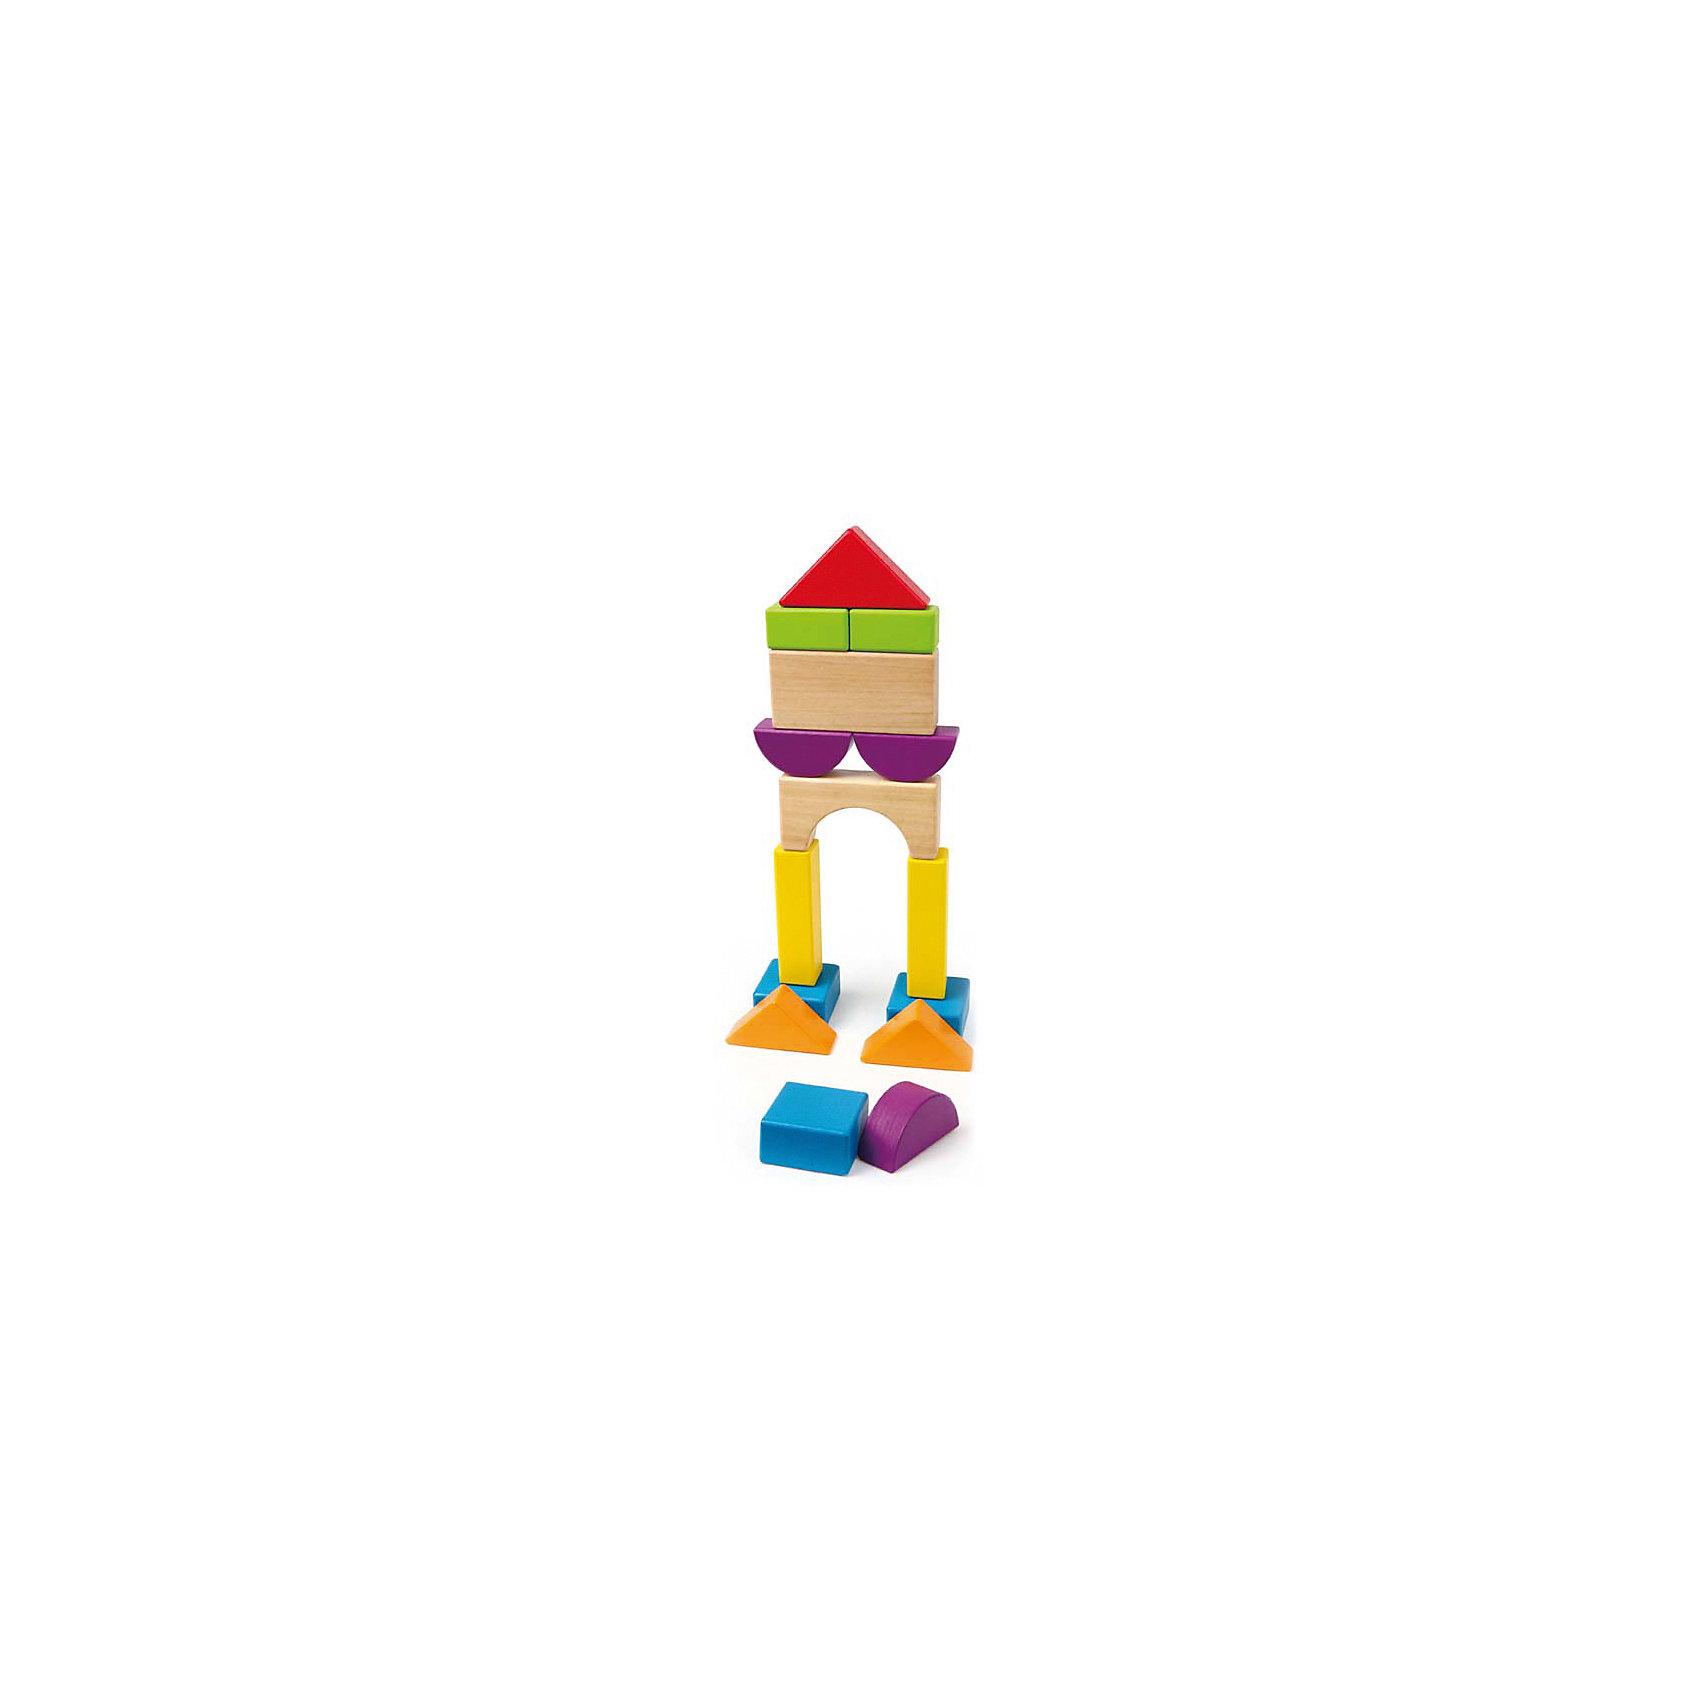 Hape Деревянная игрушка Конструктор, Hape hape деревянная музыкальная игрушка бубен